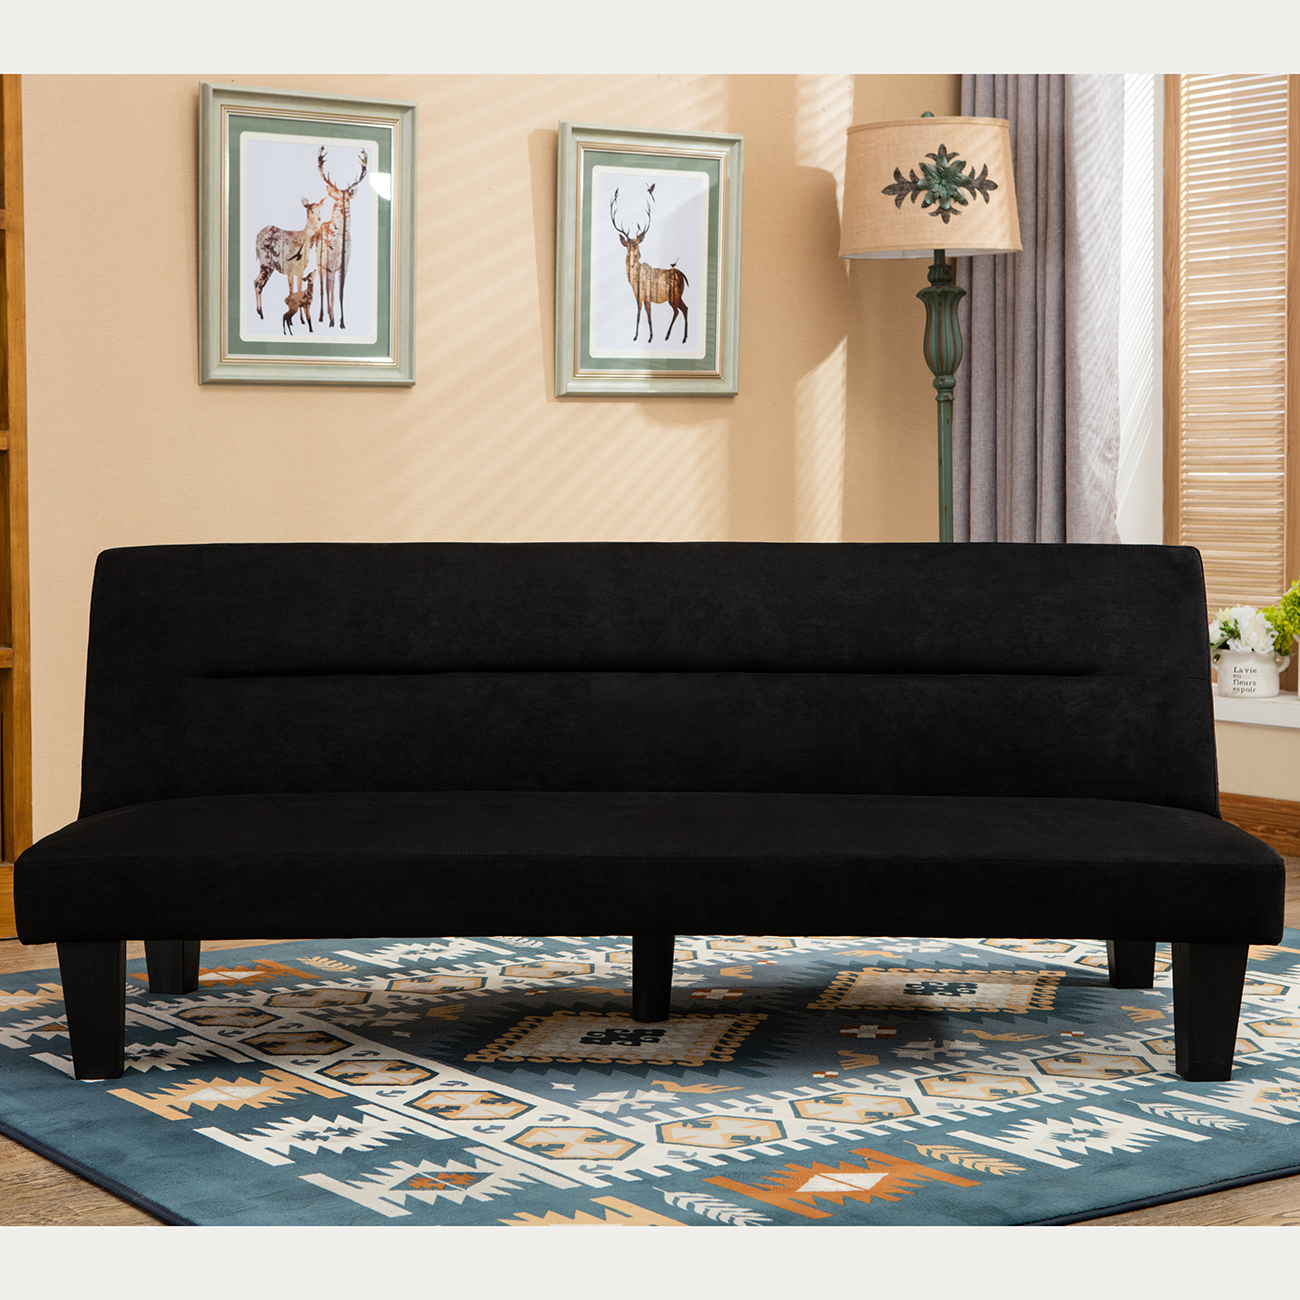 Futon Sofa Sleeper: Futon Sofa Bed Furniture Convertible Microfiber Upholstery